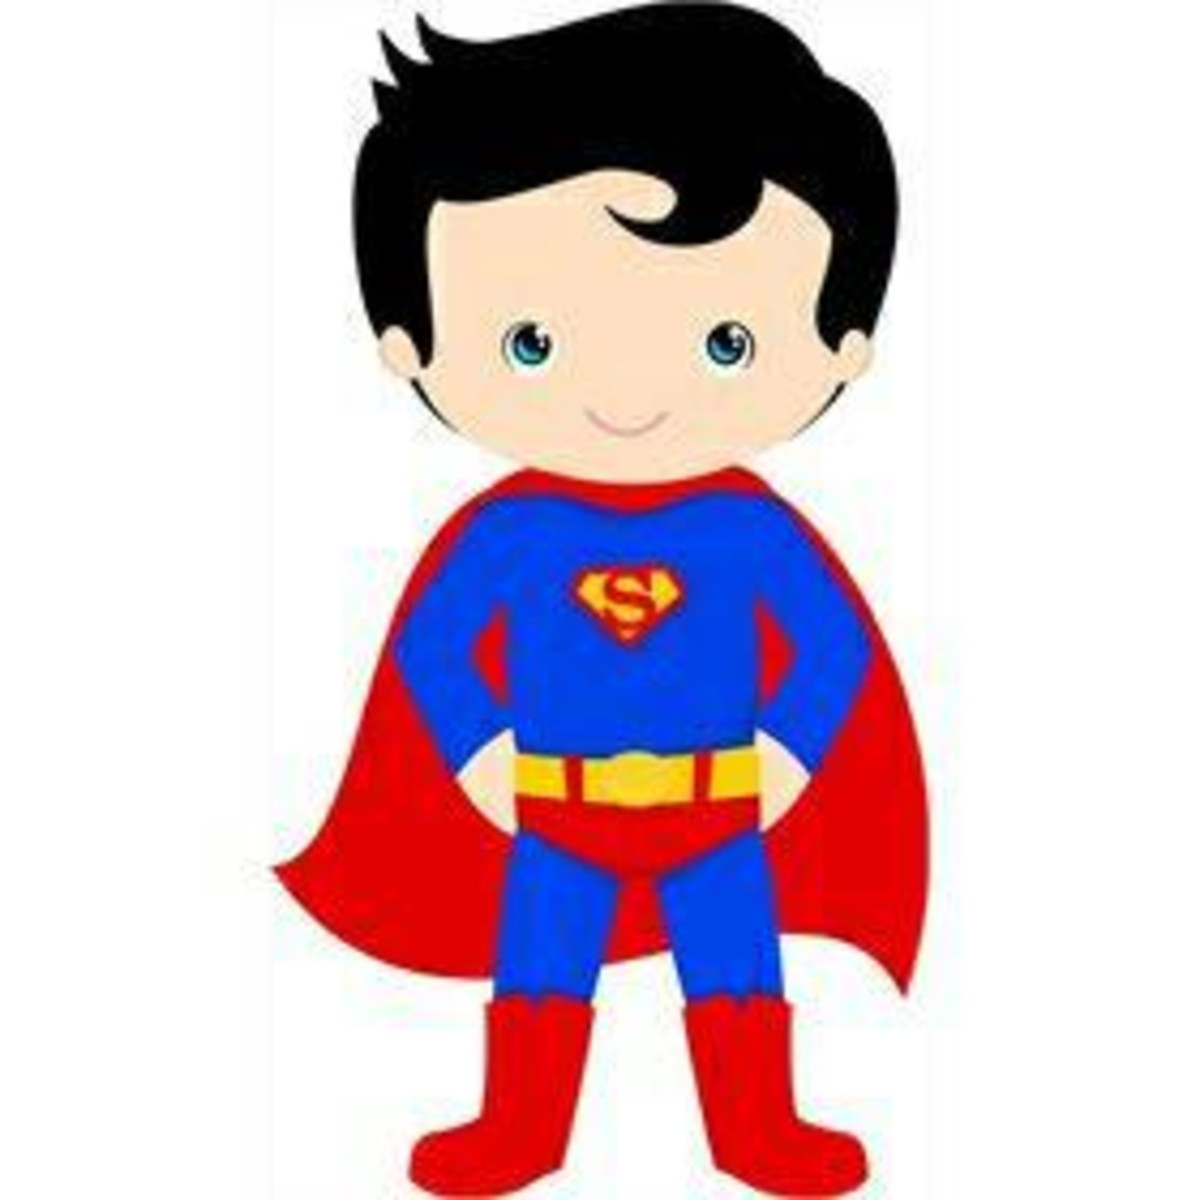 Justice League Hd Wallpaper Adesivo De Parede Super Man Baby No Elo7 Toca Do Design